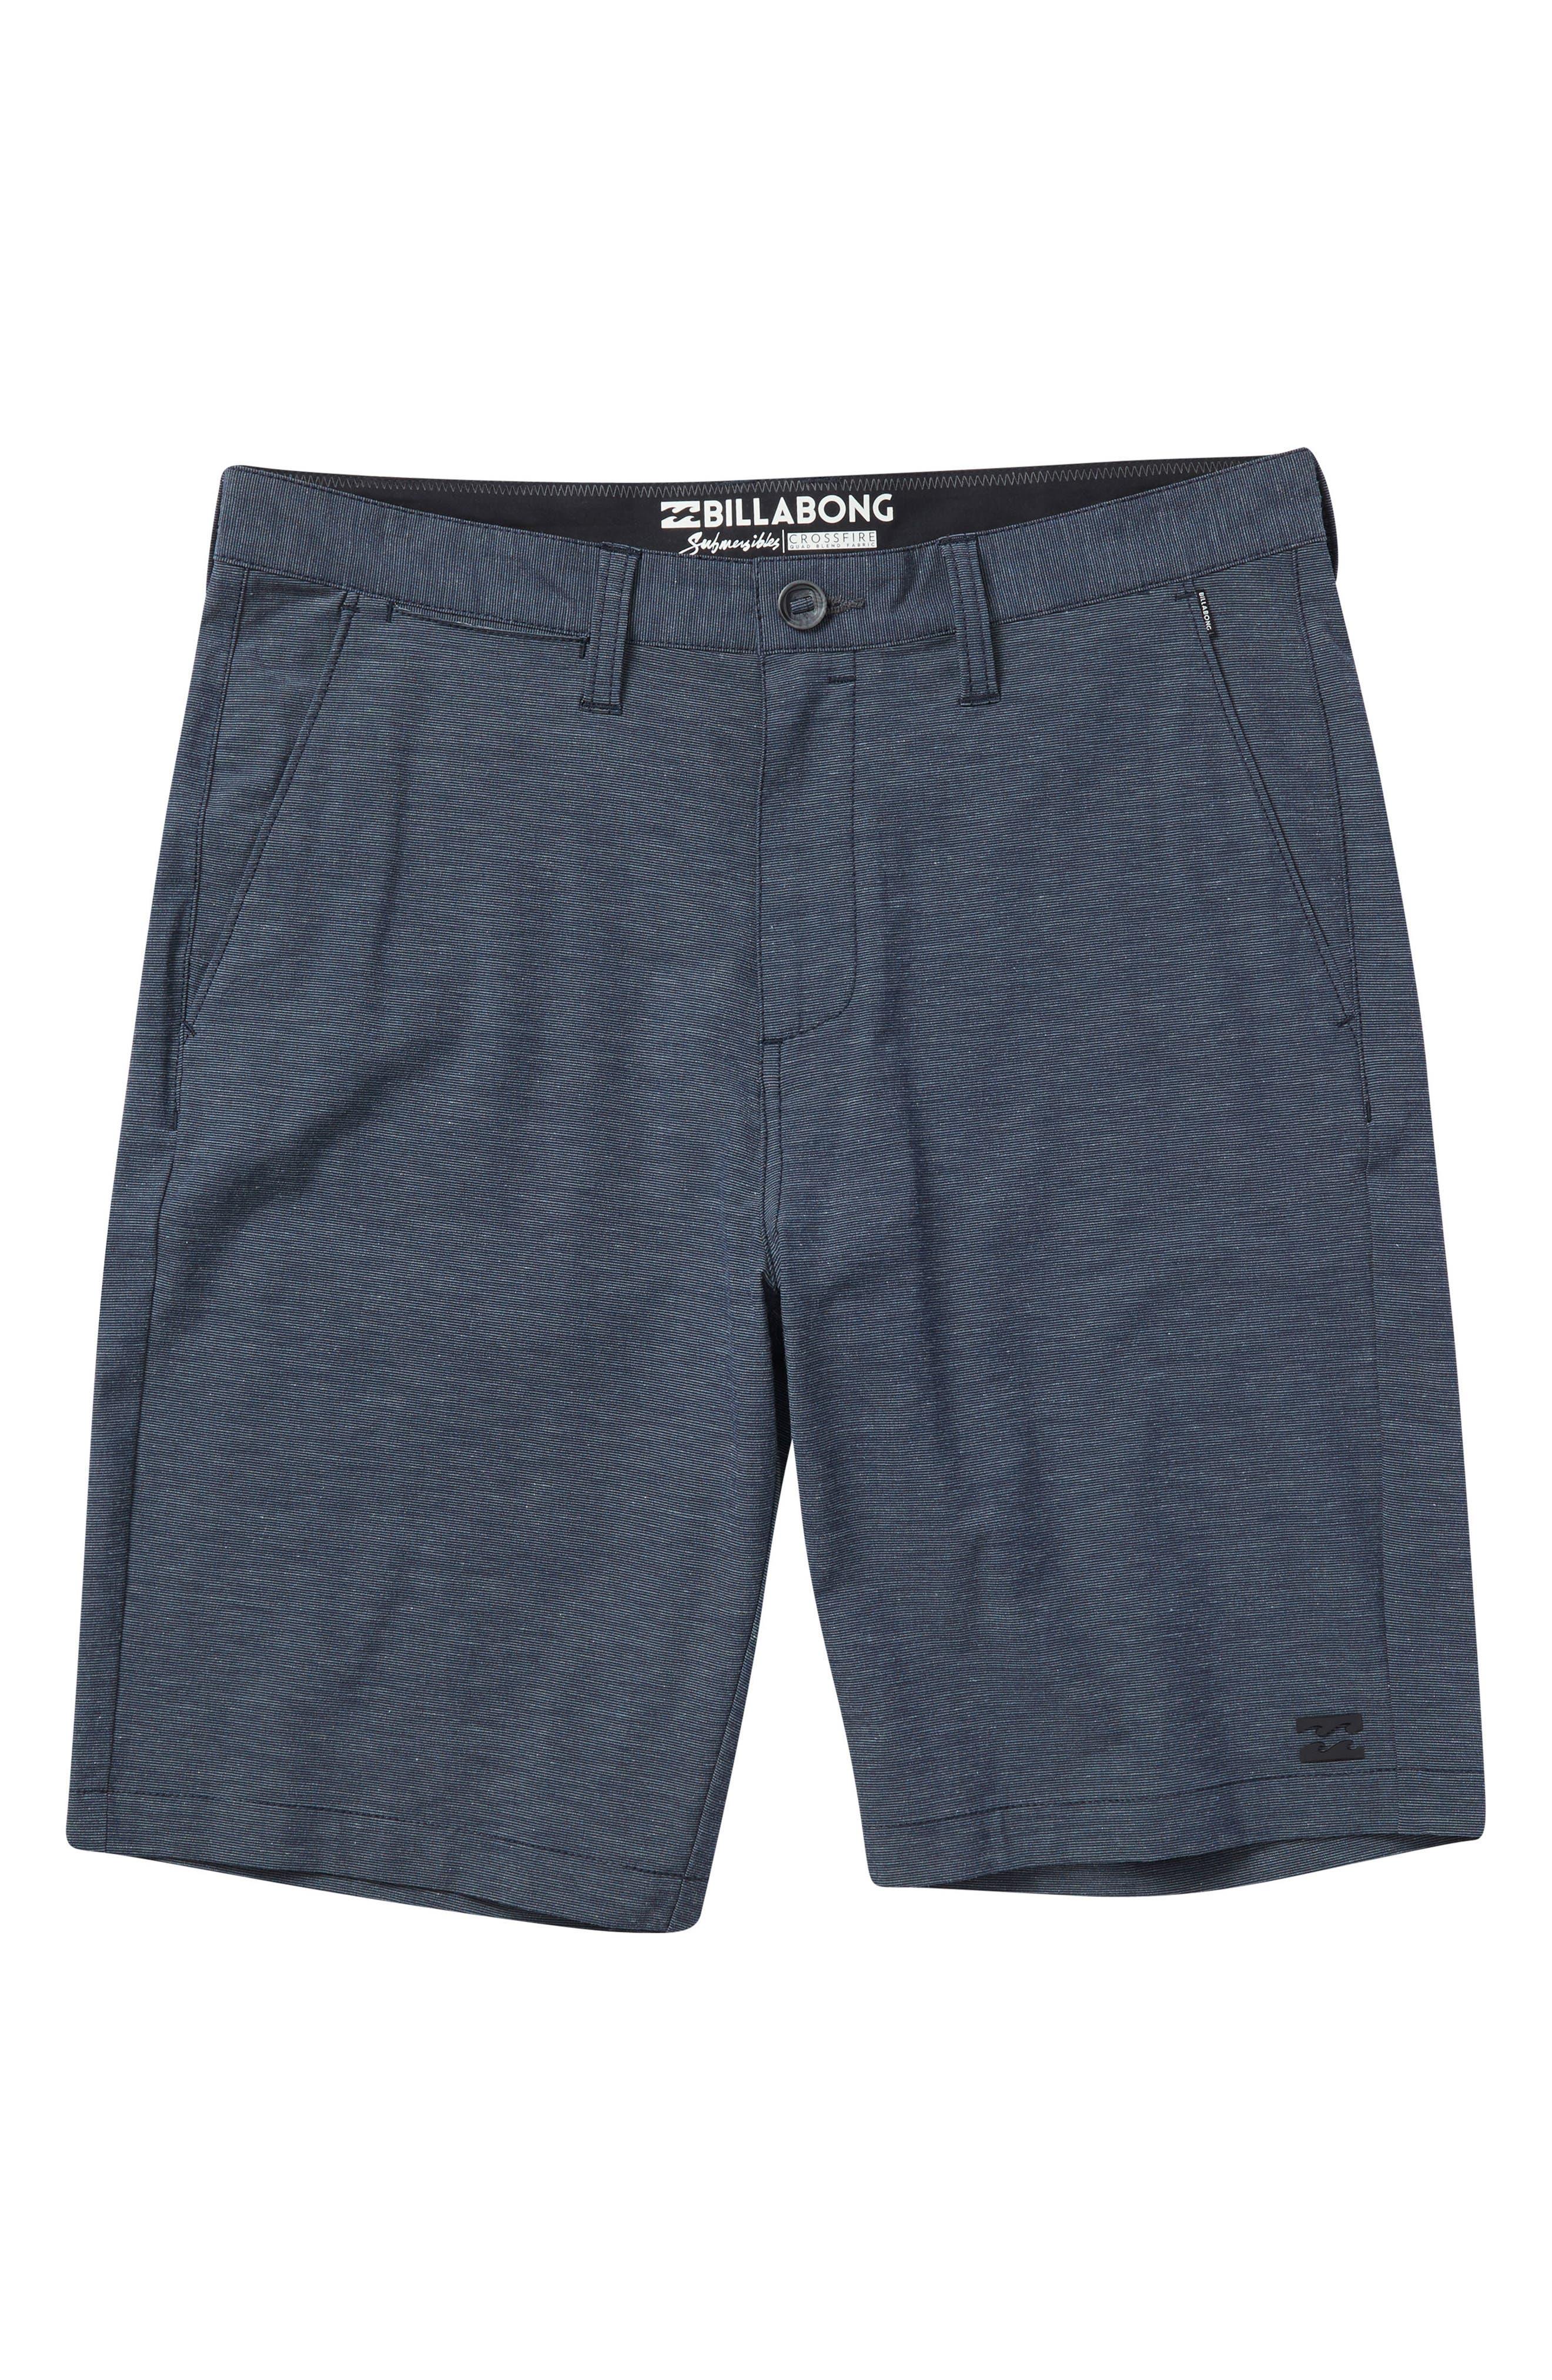 Crossfire X Hybrid Shorts,                             Main thumbnail 1, color,                             Navy